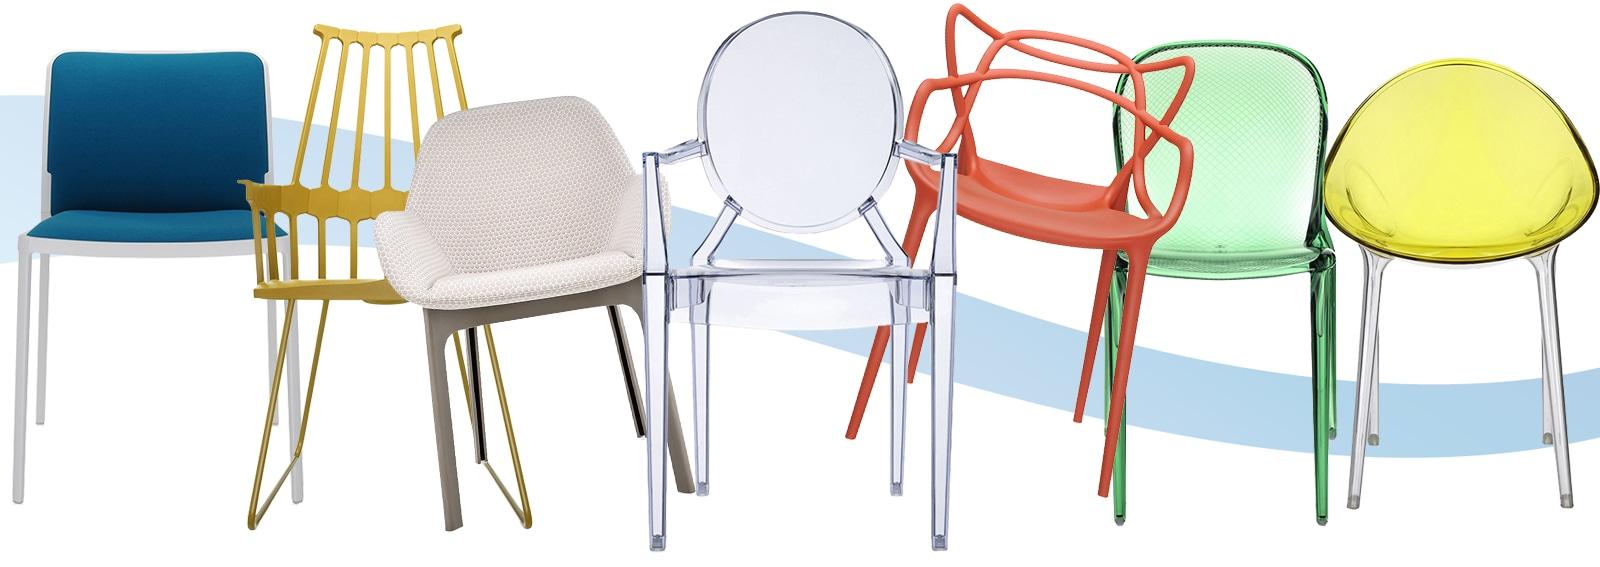 kartell le 15 sedie pi belle grazia